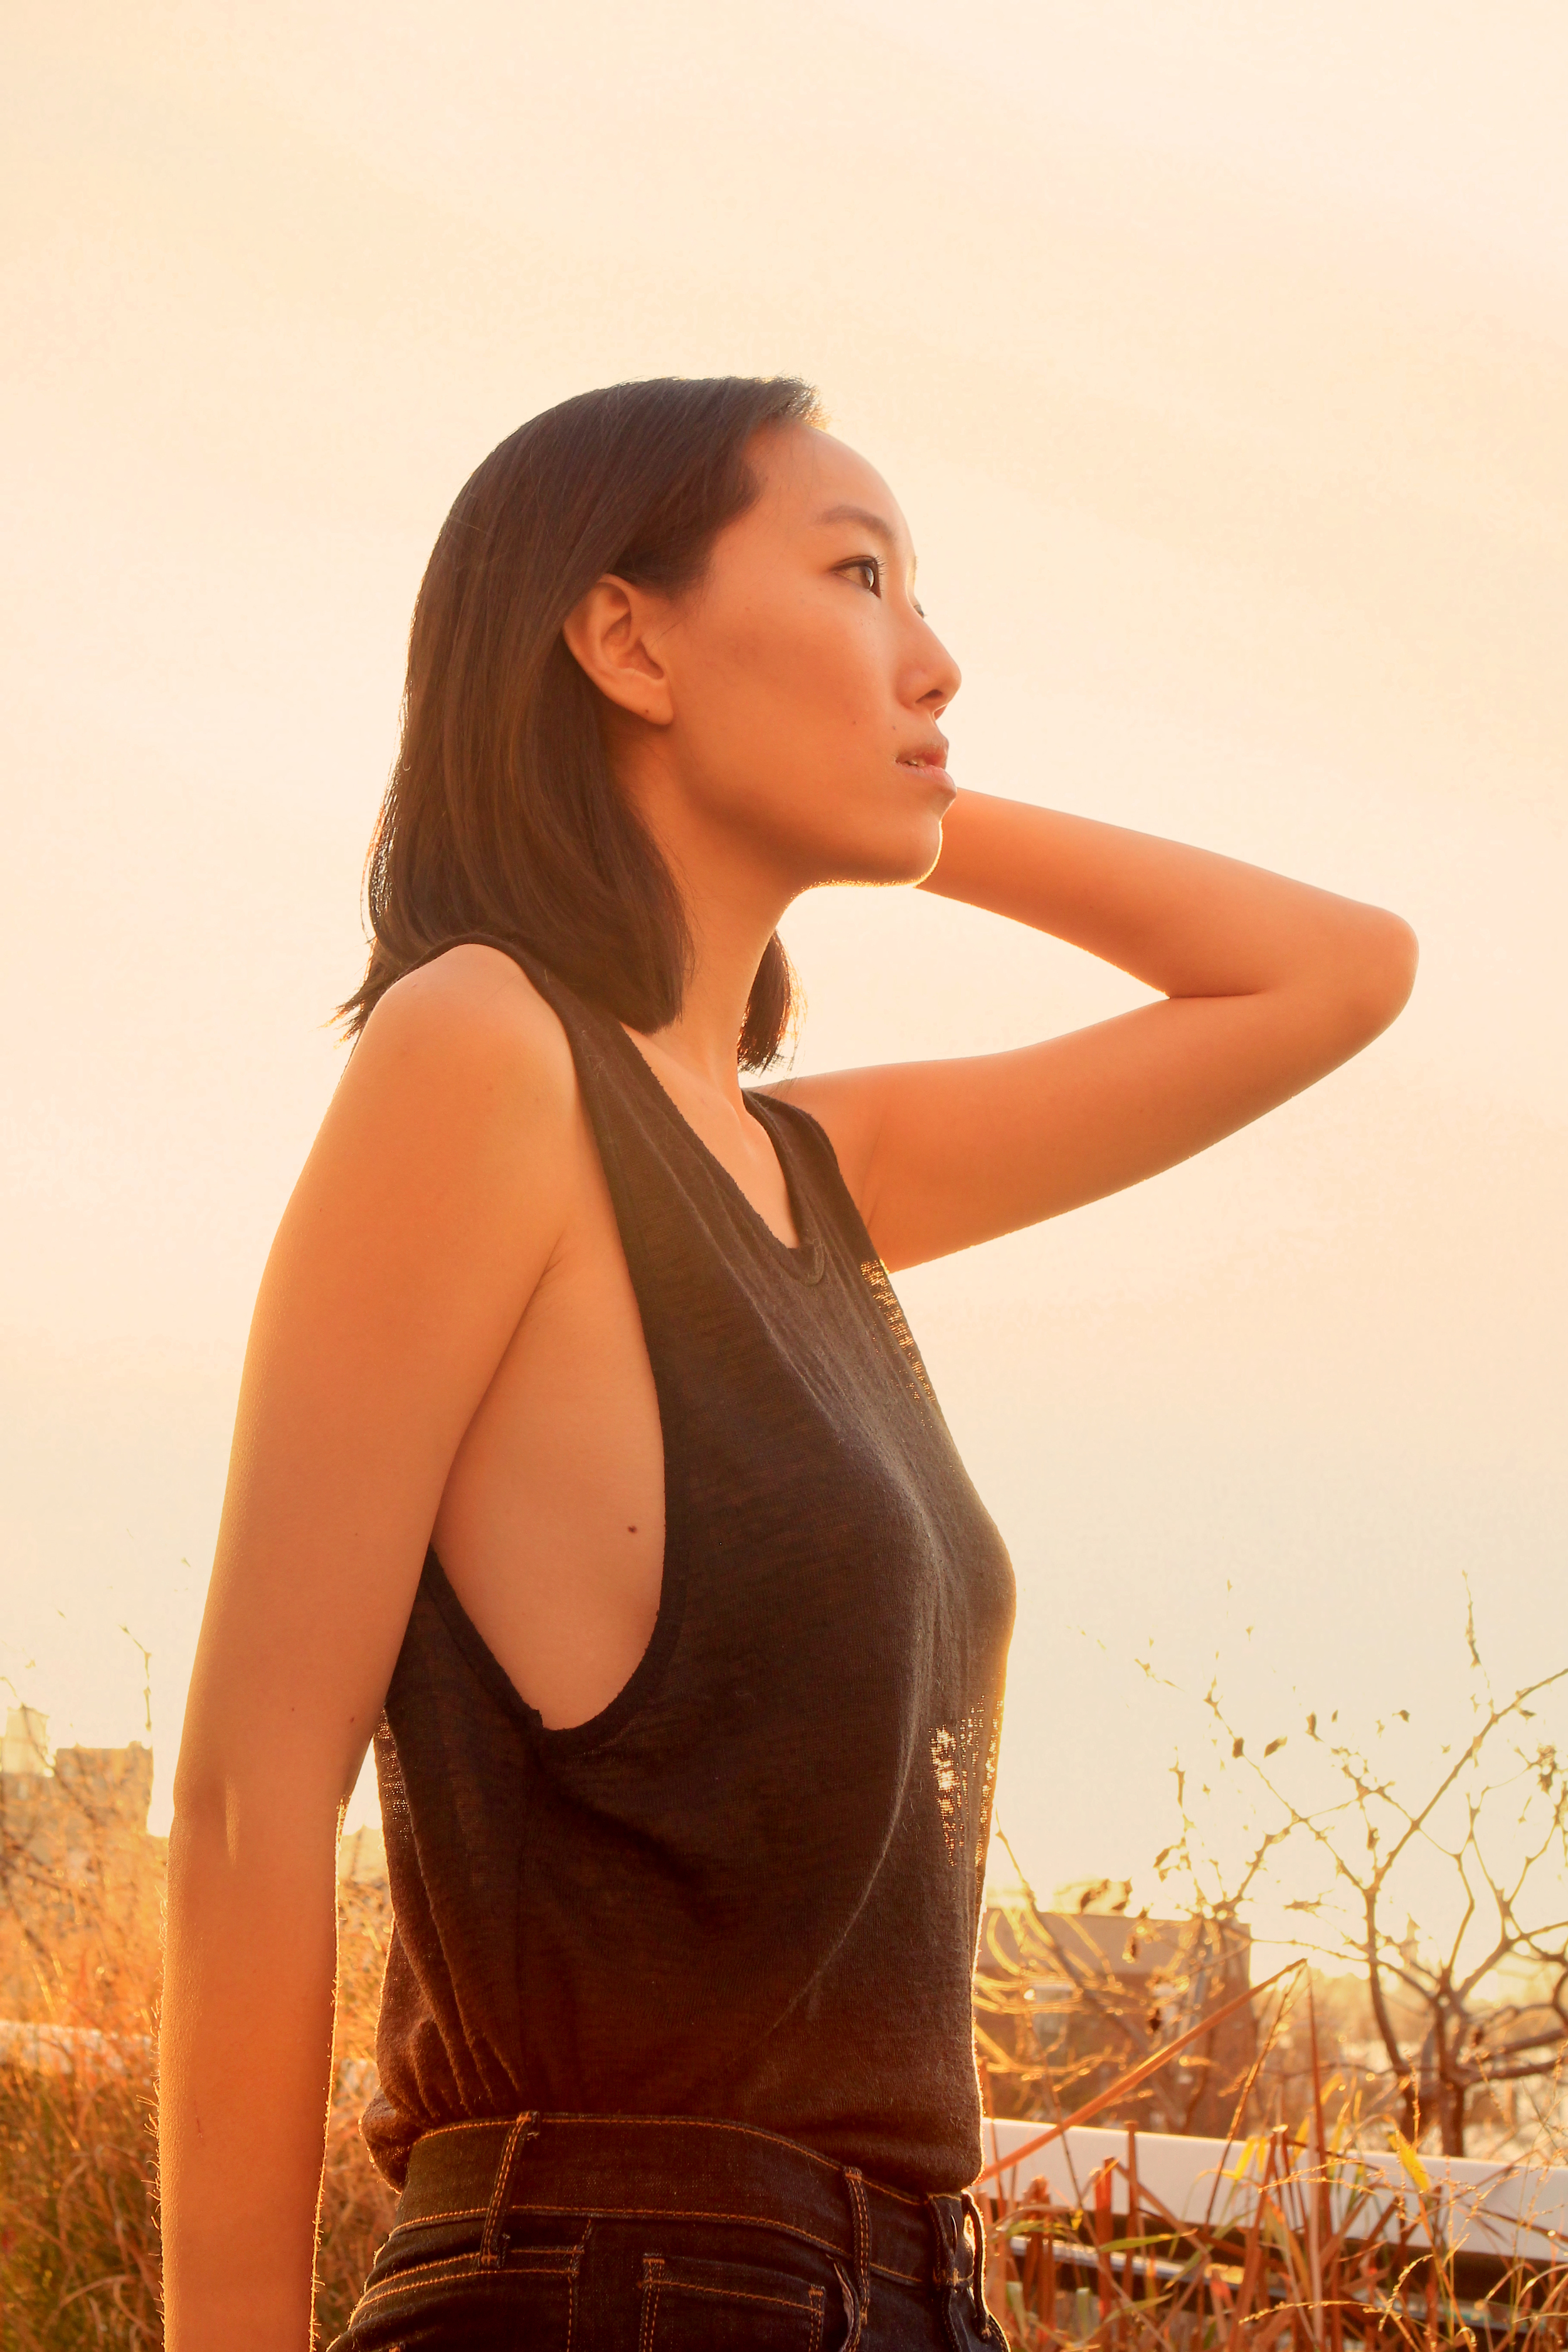 Ilin Chung Photography - Grace Yang - IMG_9028.jpg